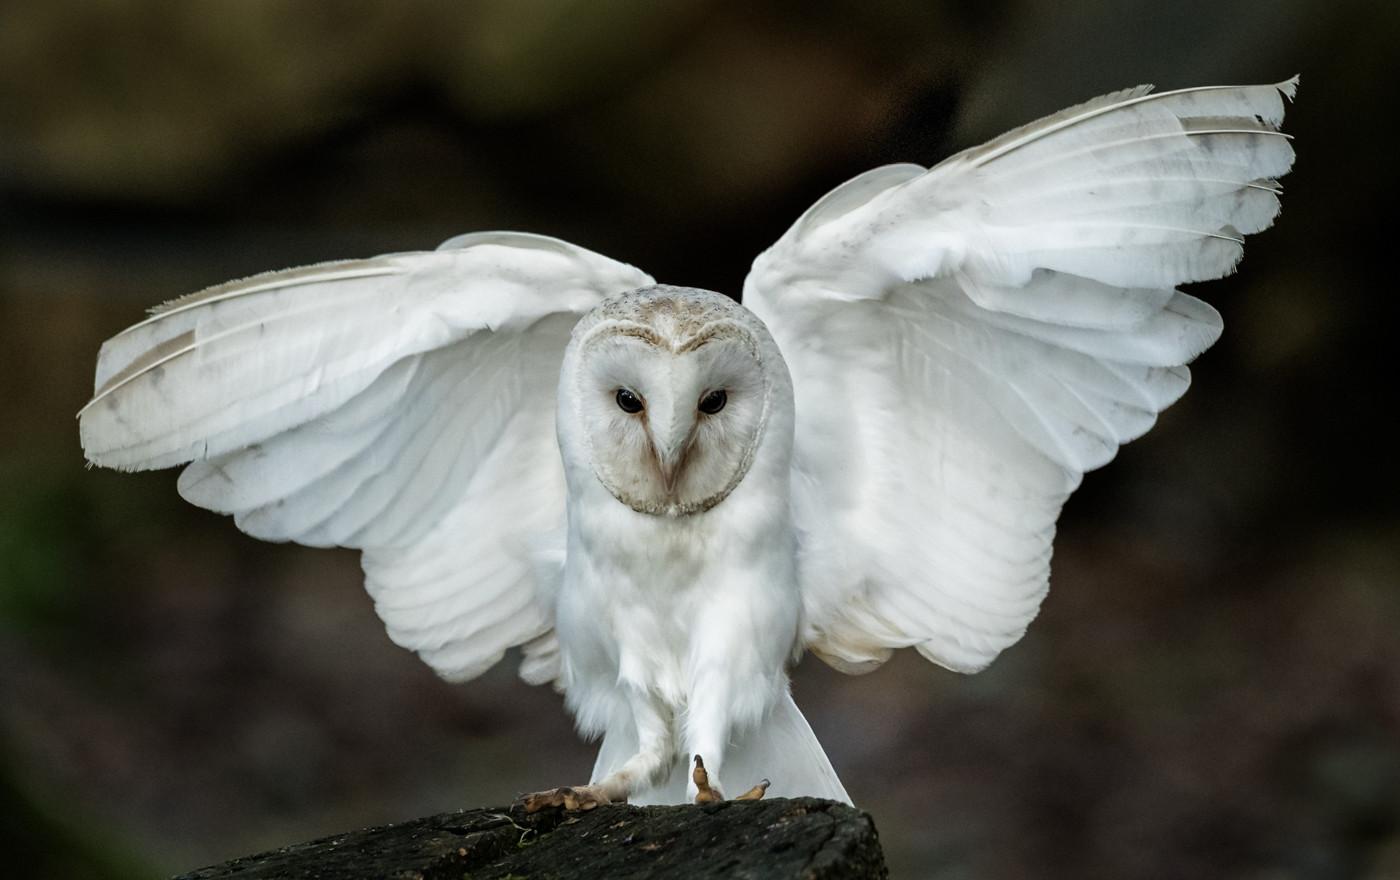 BARN OWL TOUCHDOWN by David Godfrey